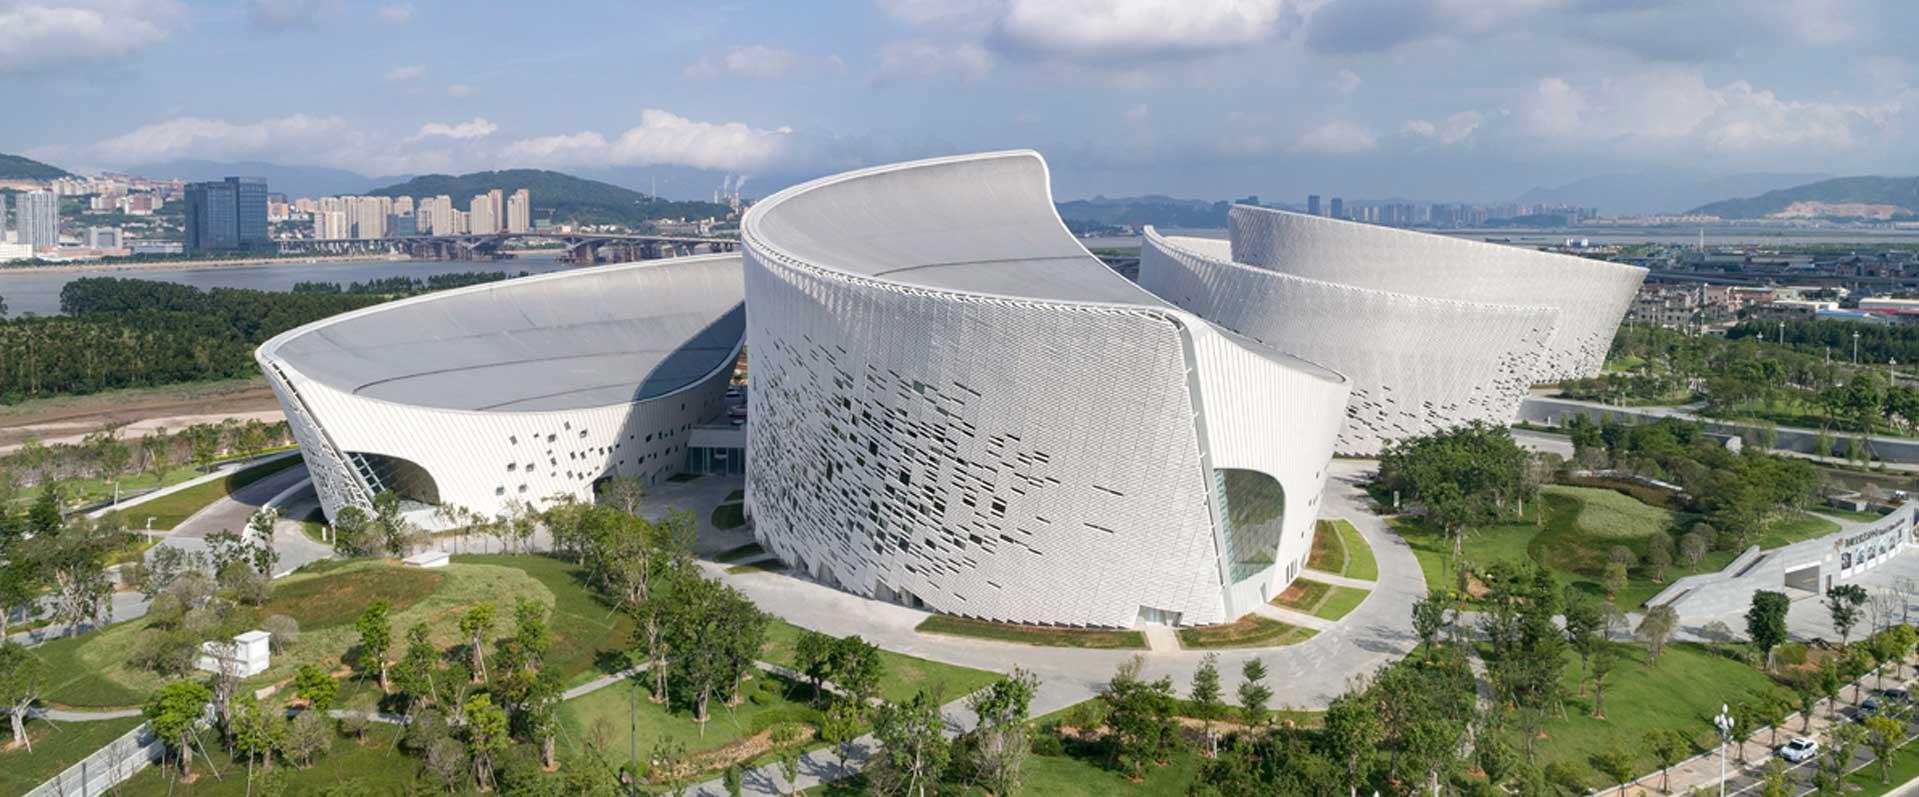 1-strait-culture-and-art-center-fuzhou-chine-pes-architects-new-78